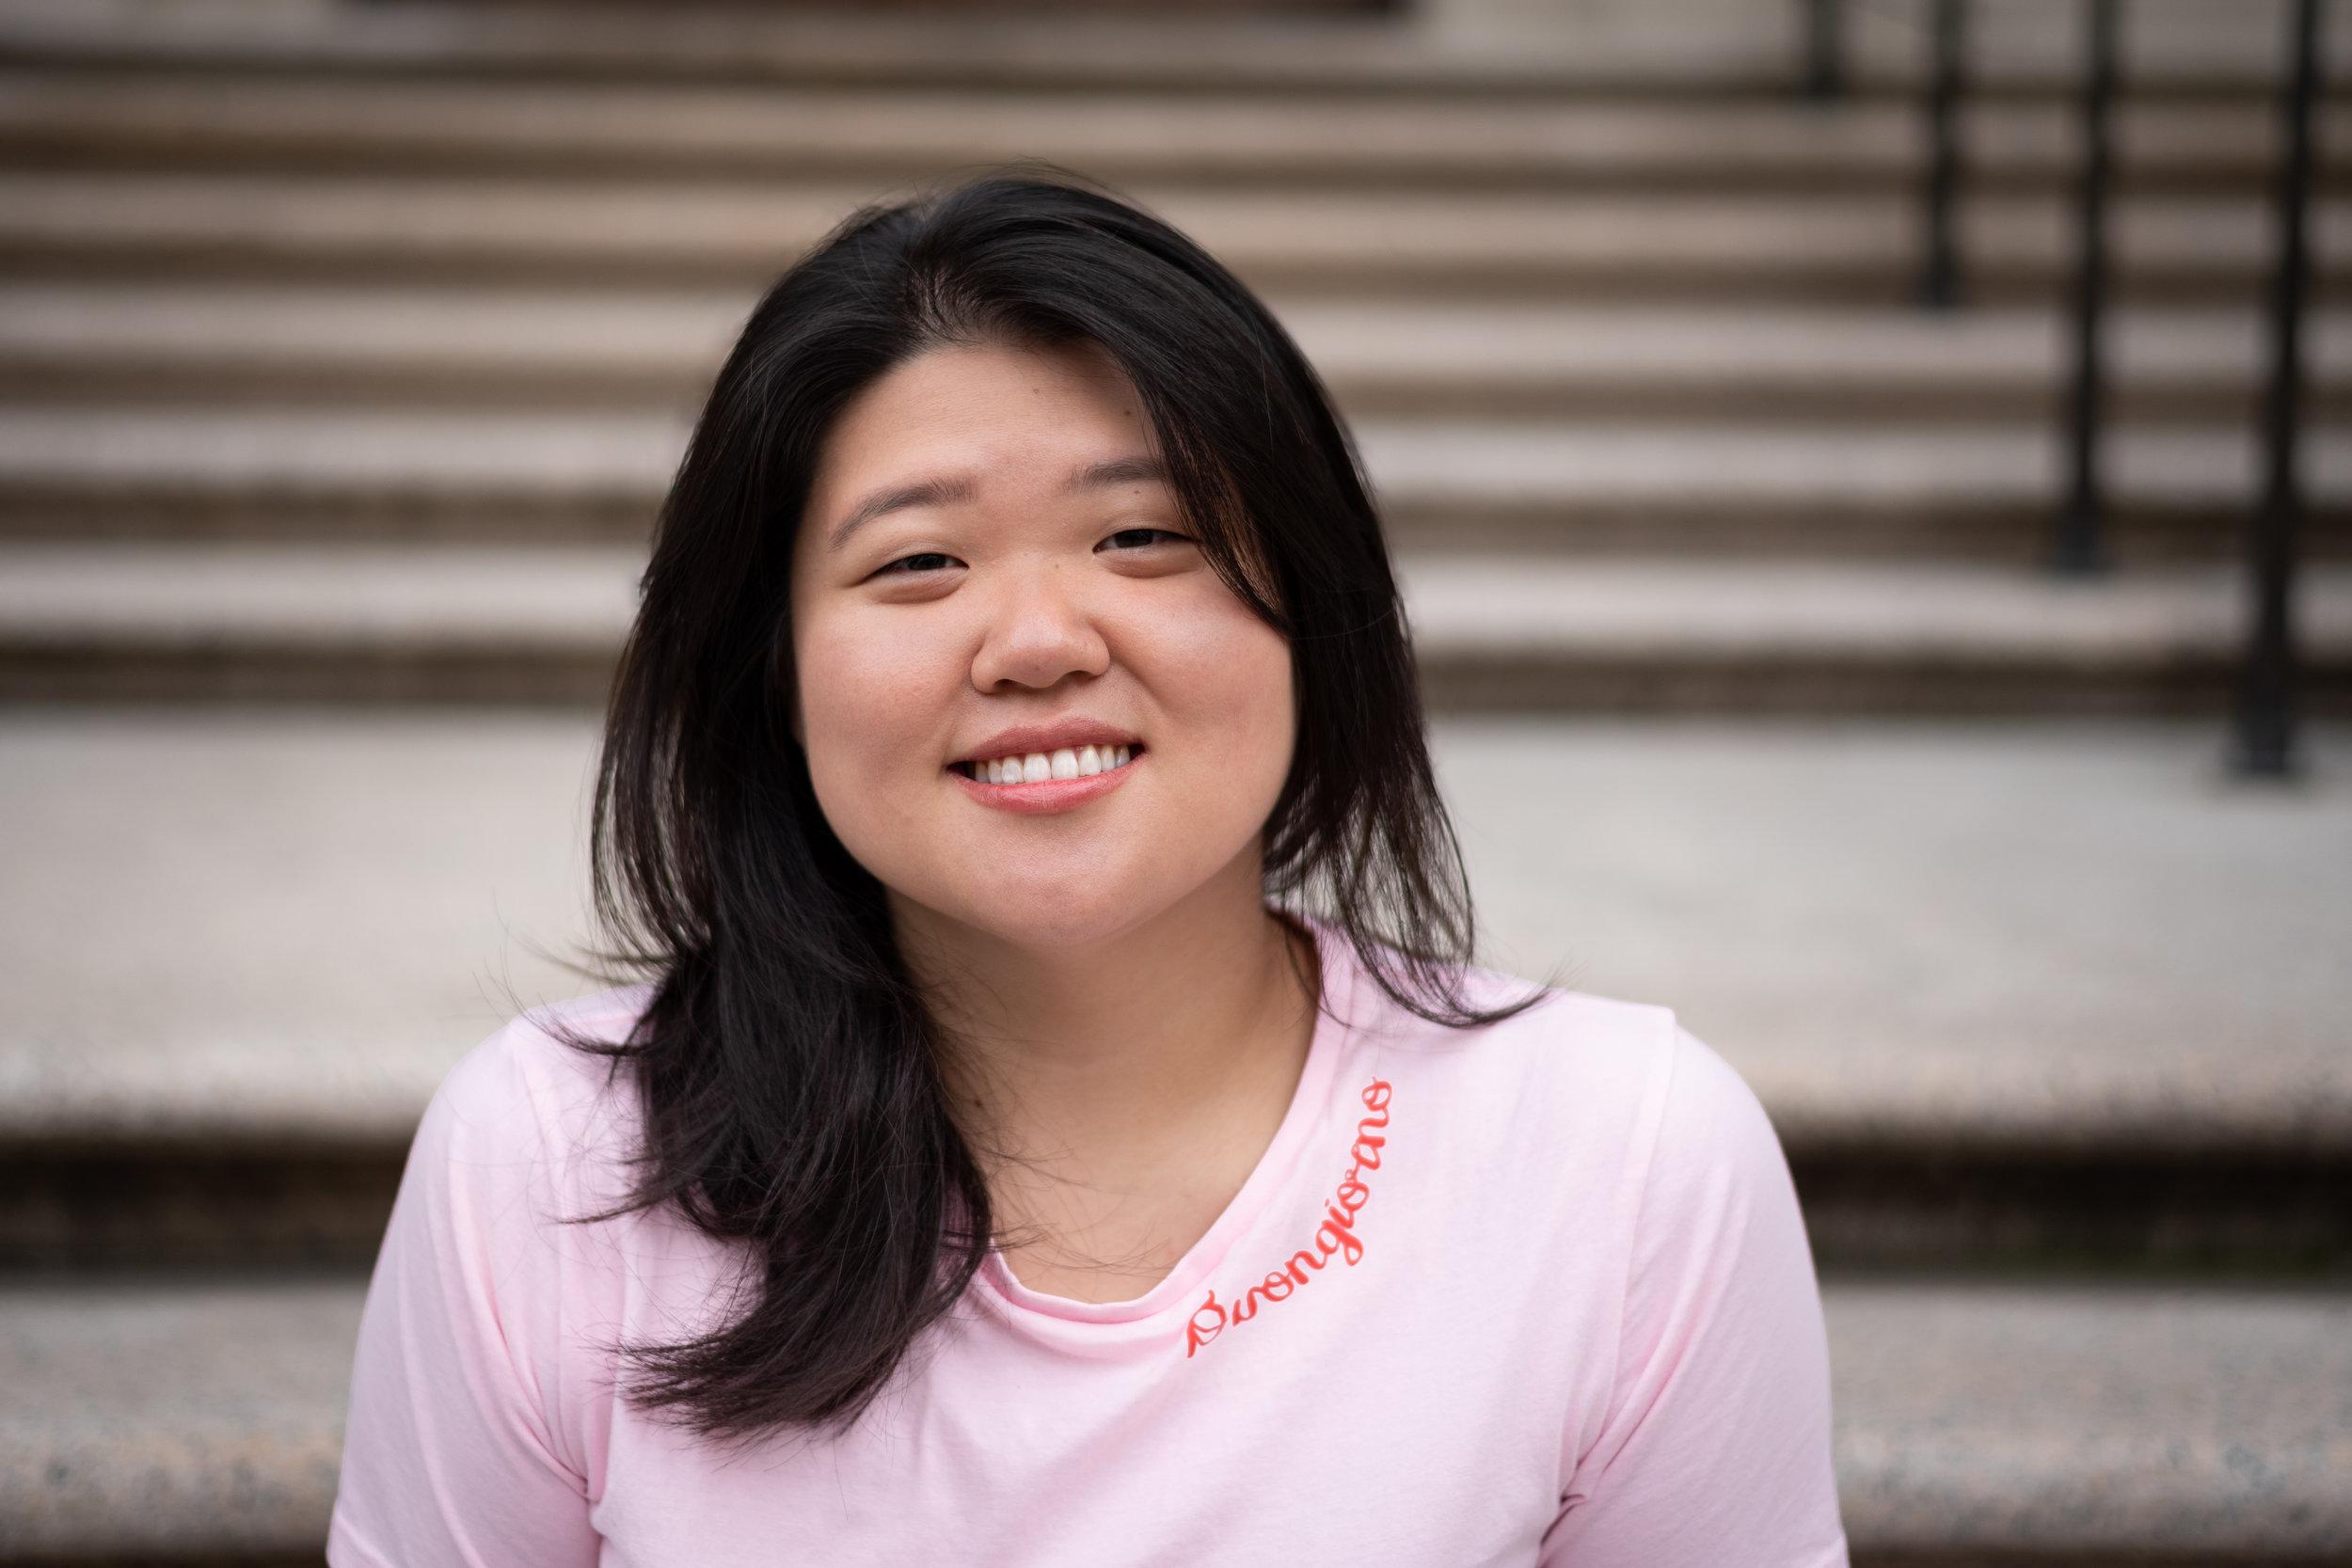 Rosa McGee | Software Engineer, Adobe